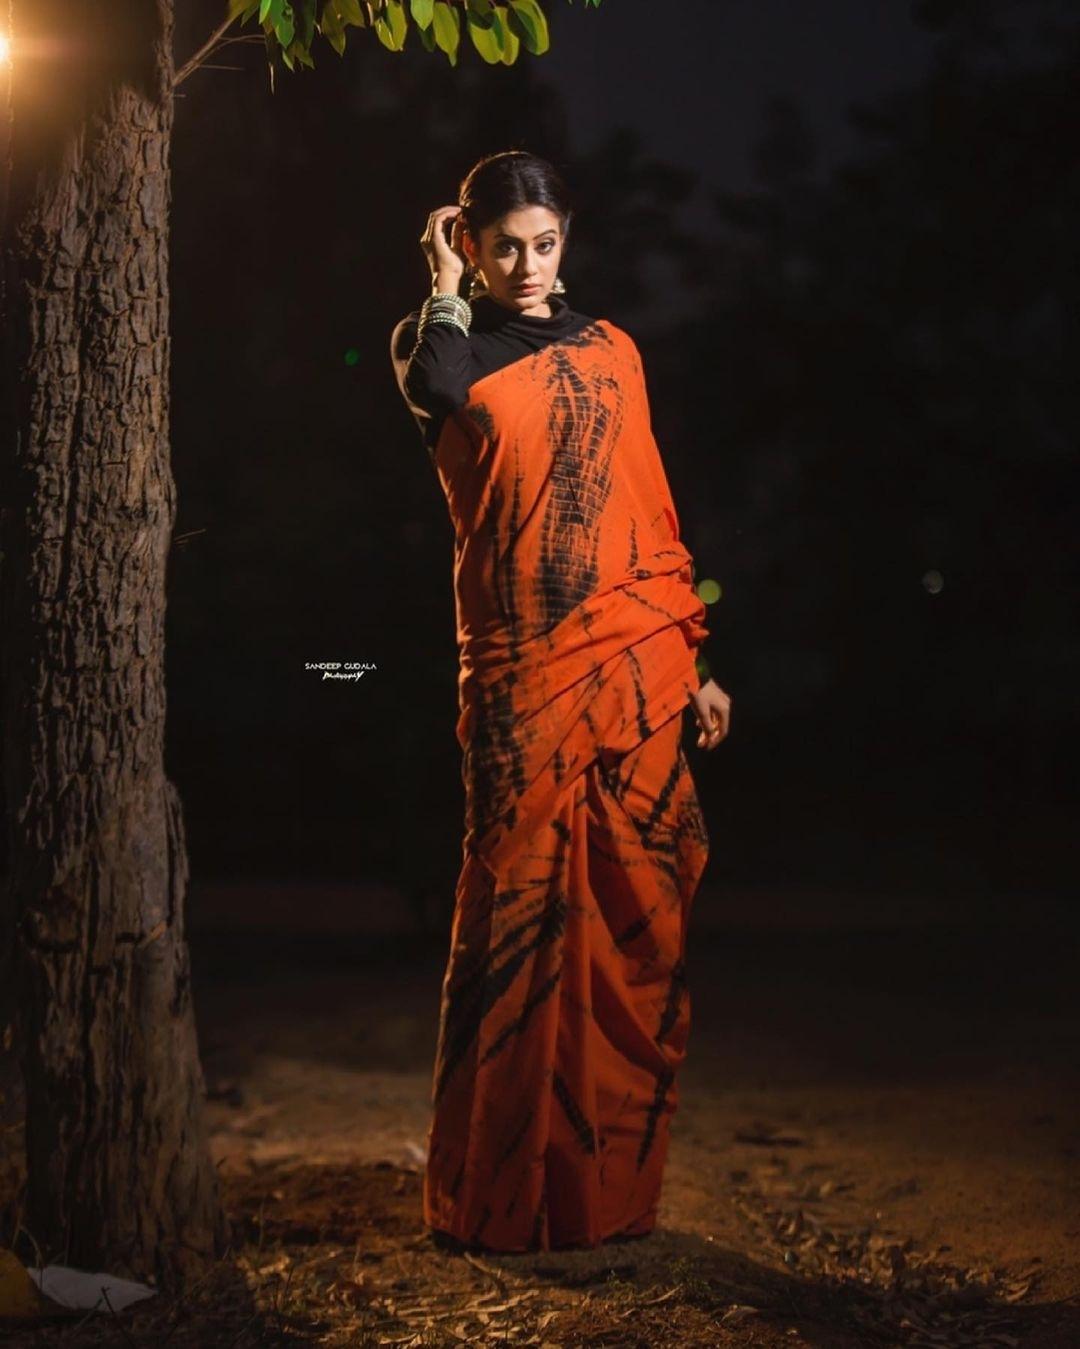 Priya Mani Raj in orange tie-dyed saree by Baisa crafts for dhee kings